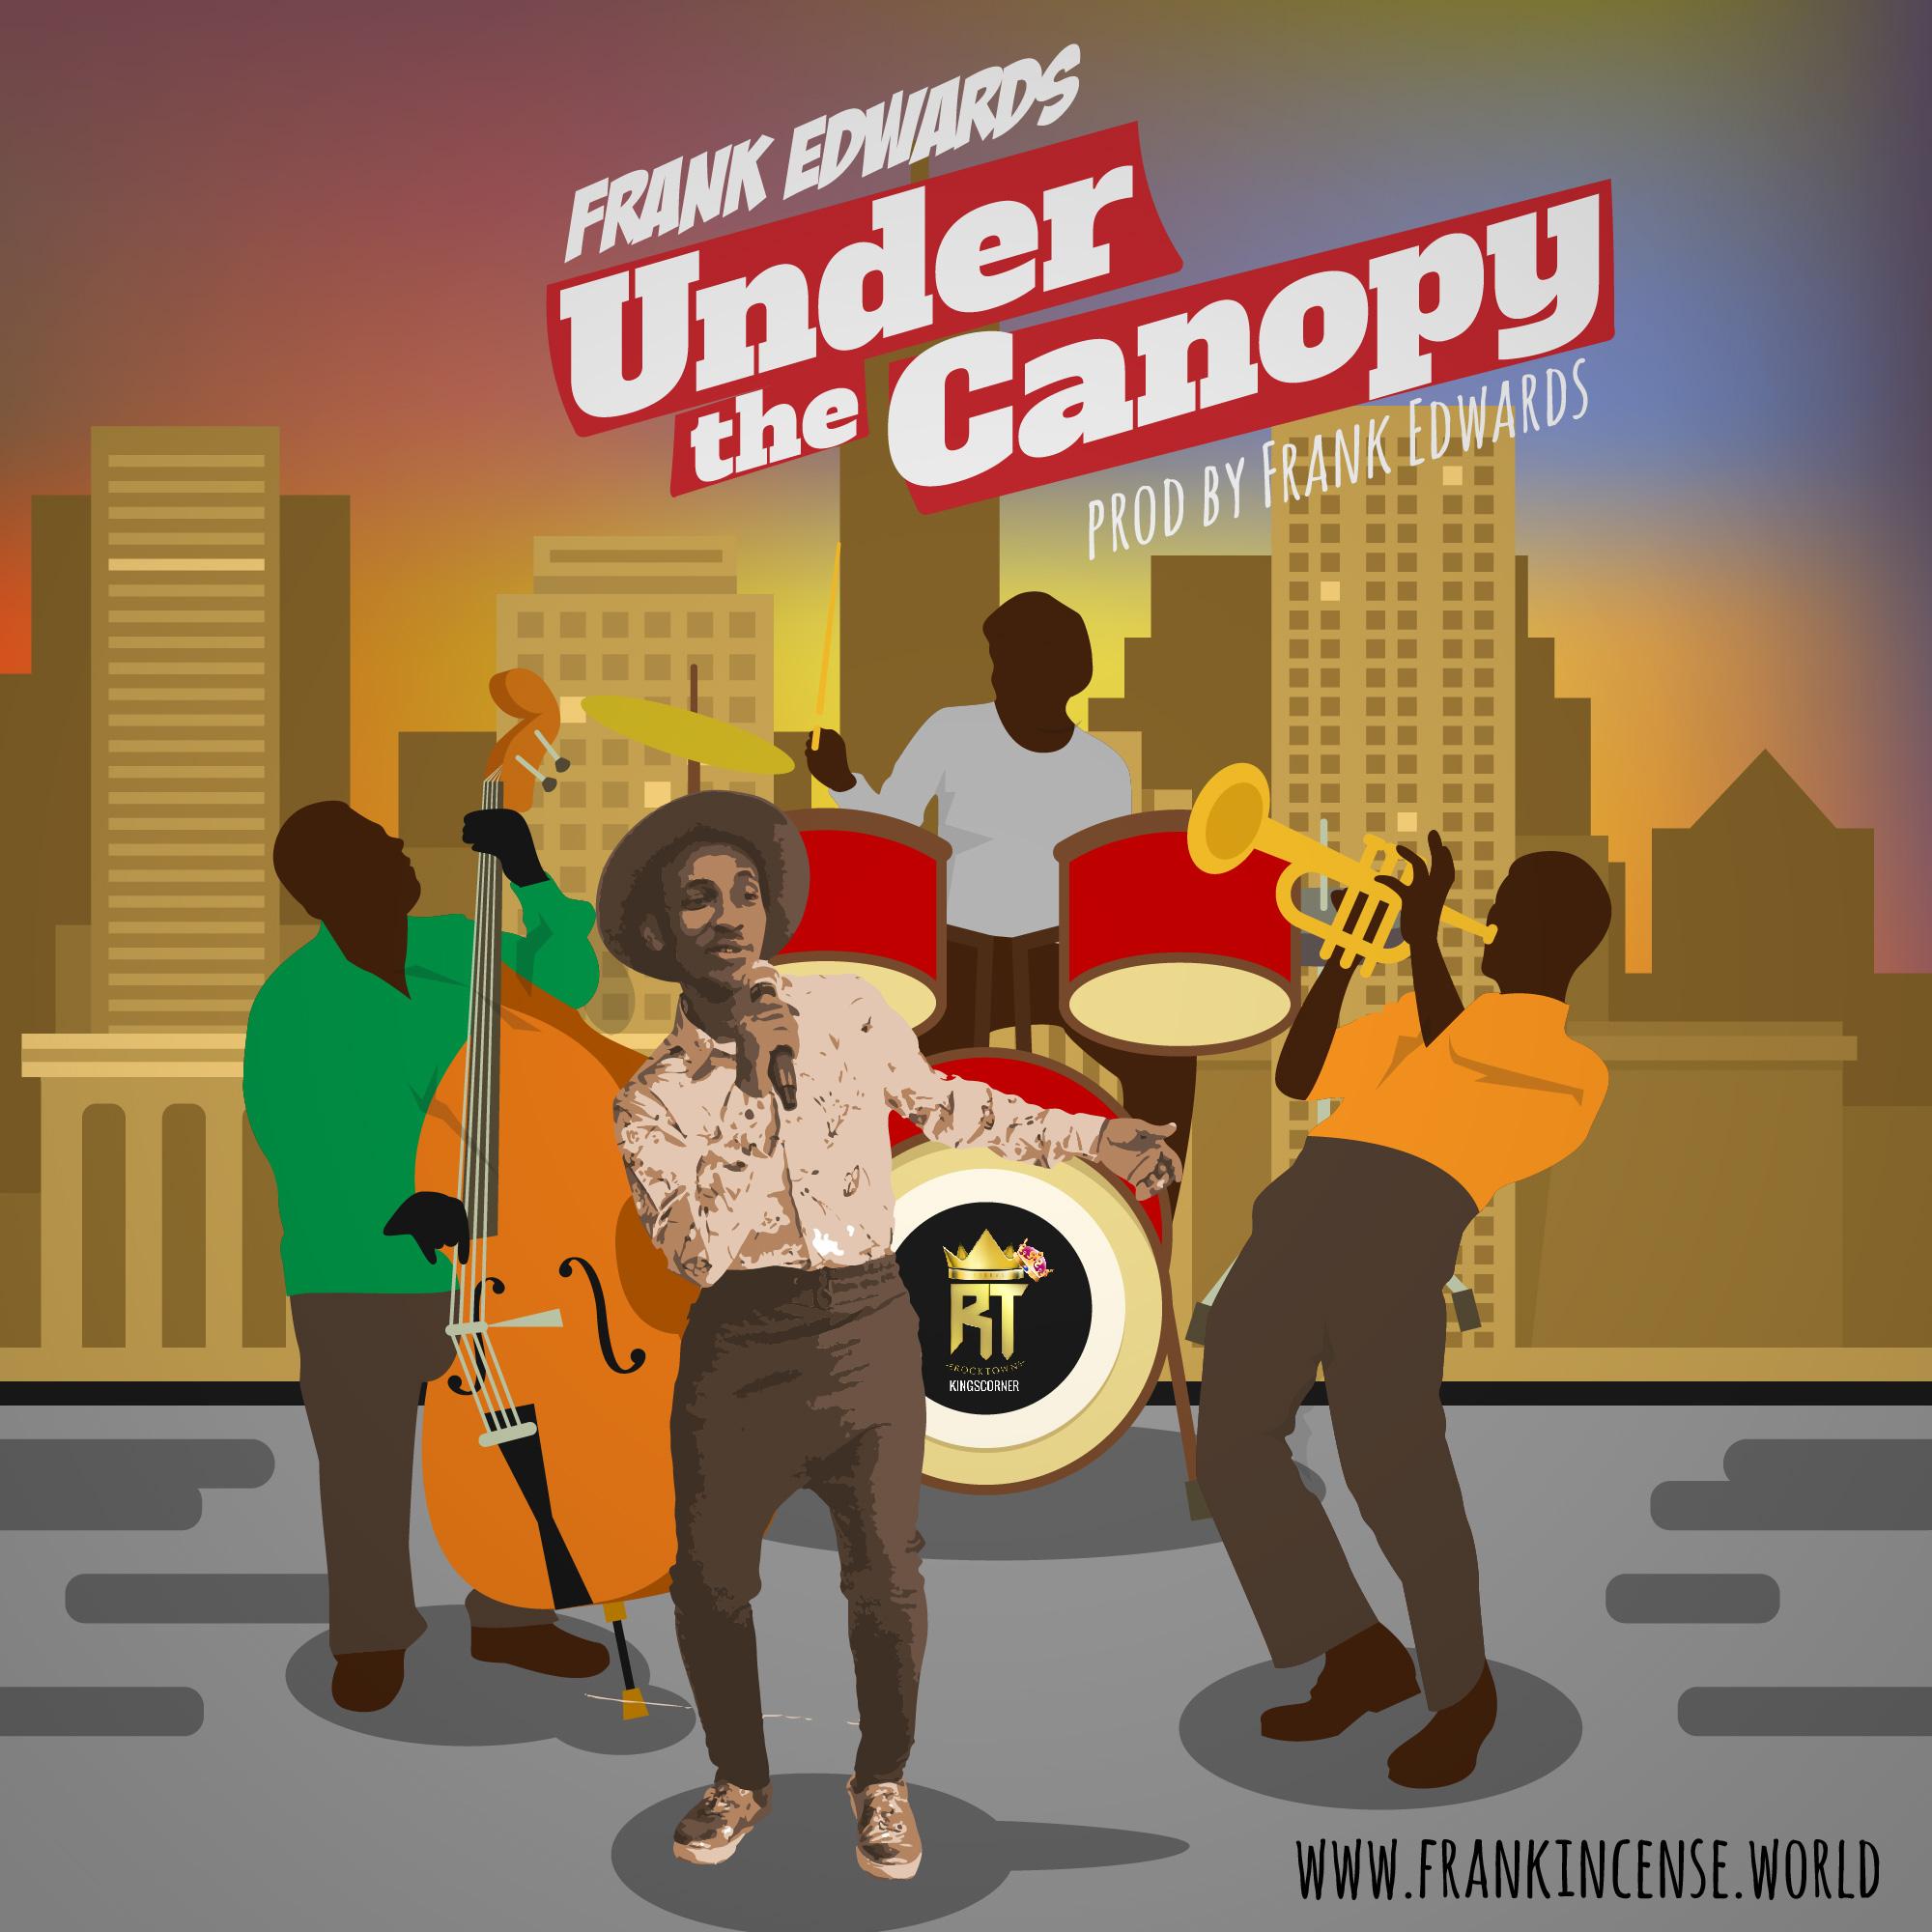 frank edward under the canopy chord progression yallemedia.com